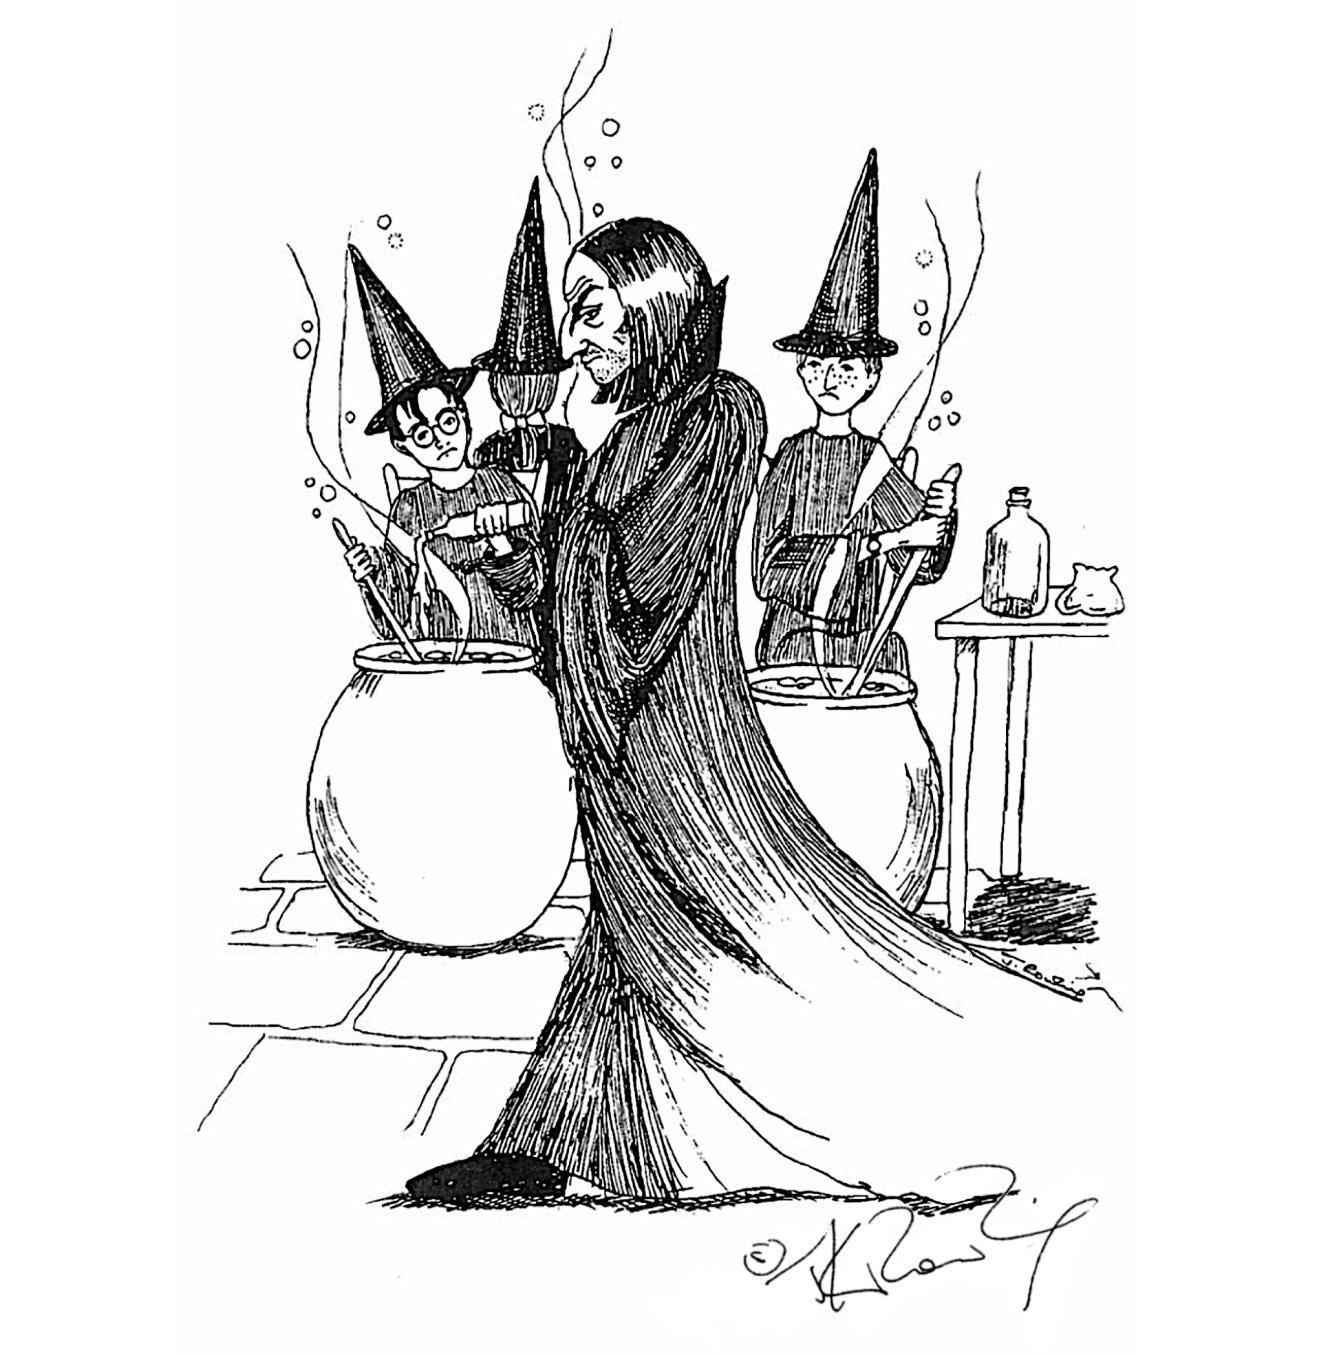 Snape in potions class (J.K. Rowling sketch)